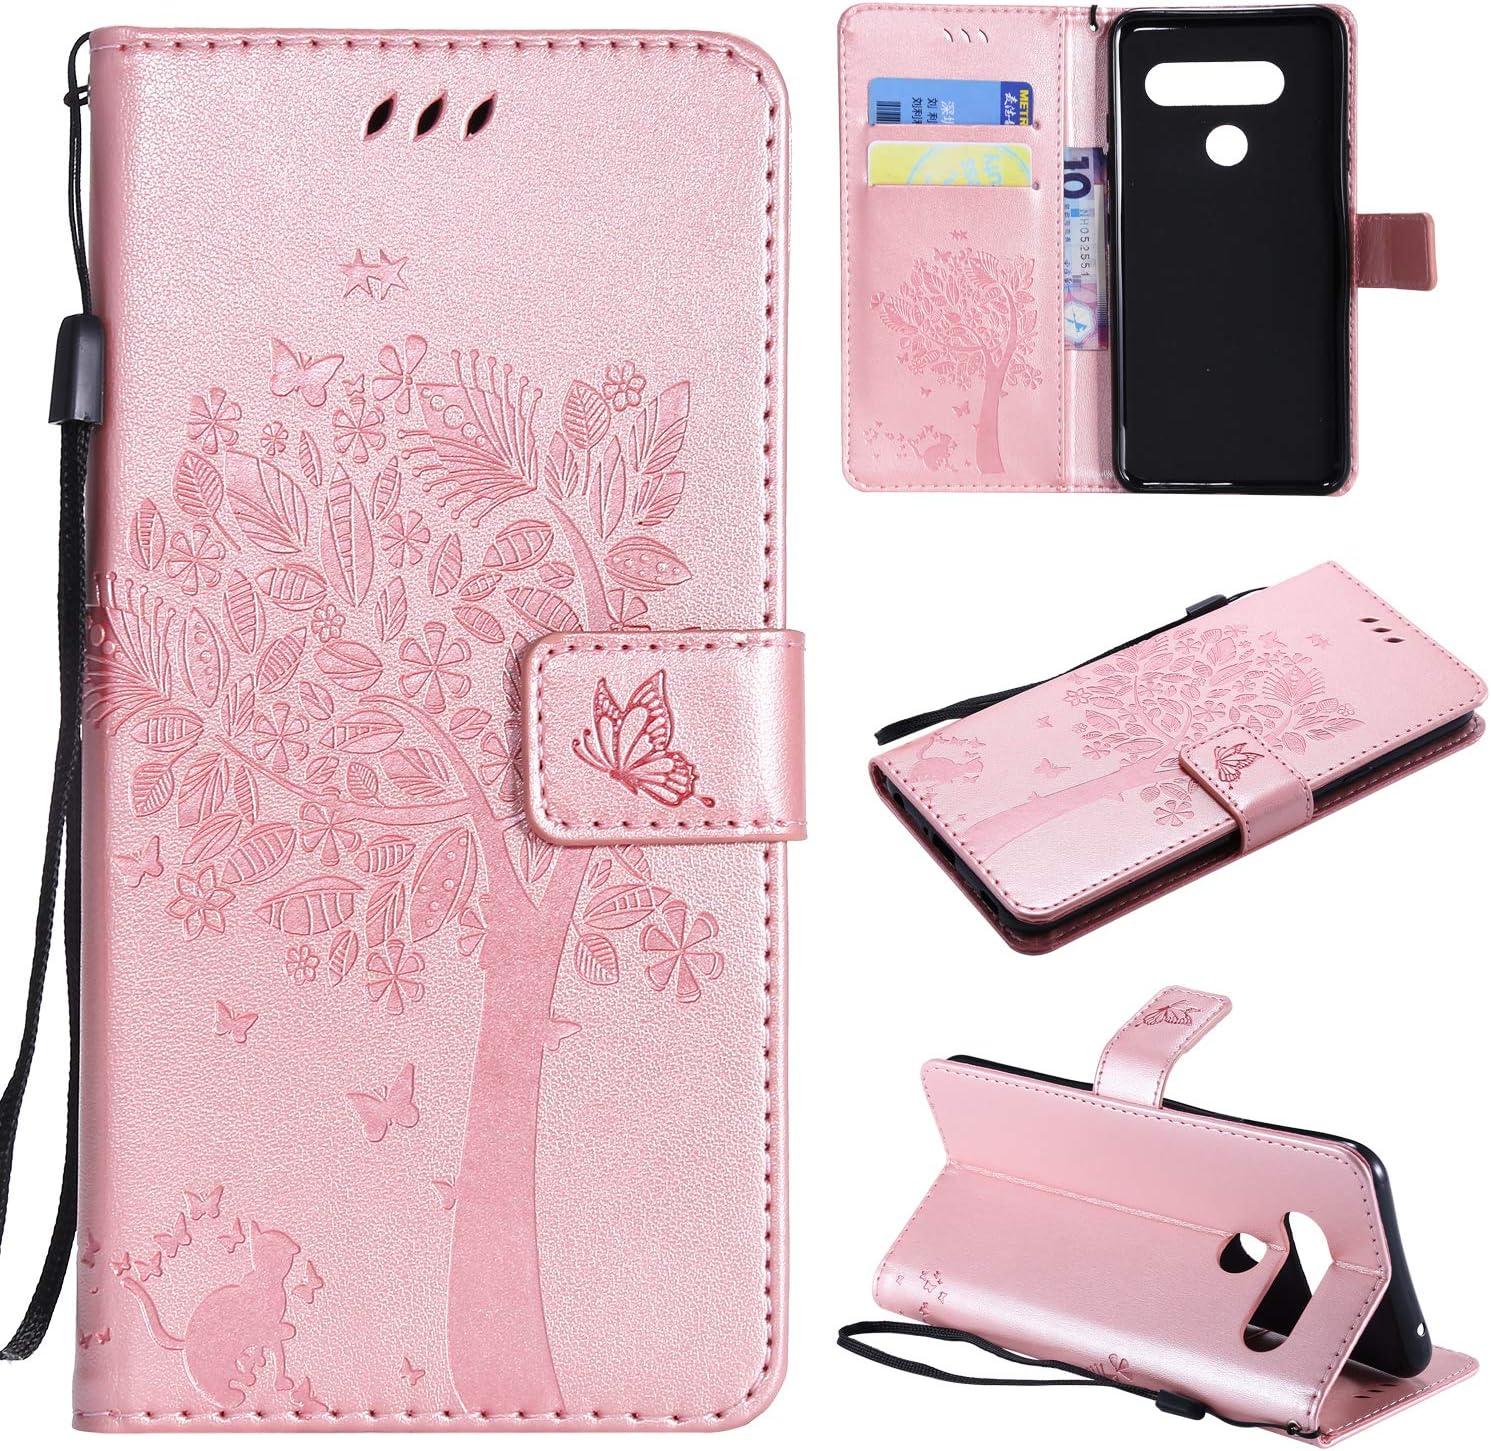 NOMO Free Shipping New LG V40 ThinQ Many popular brands Case Wallet Flip